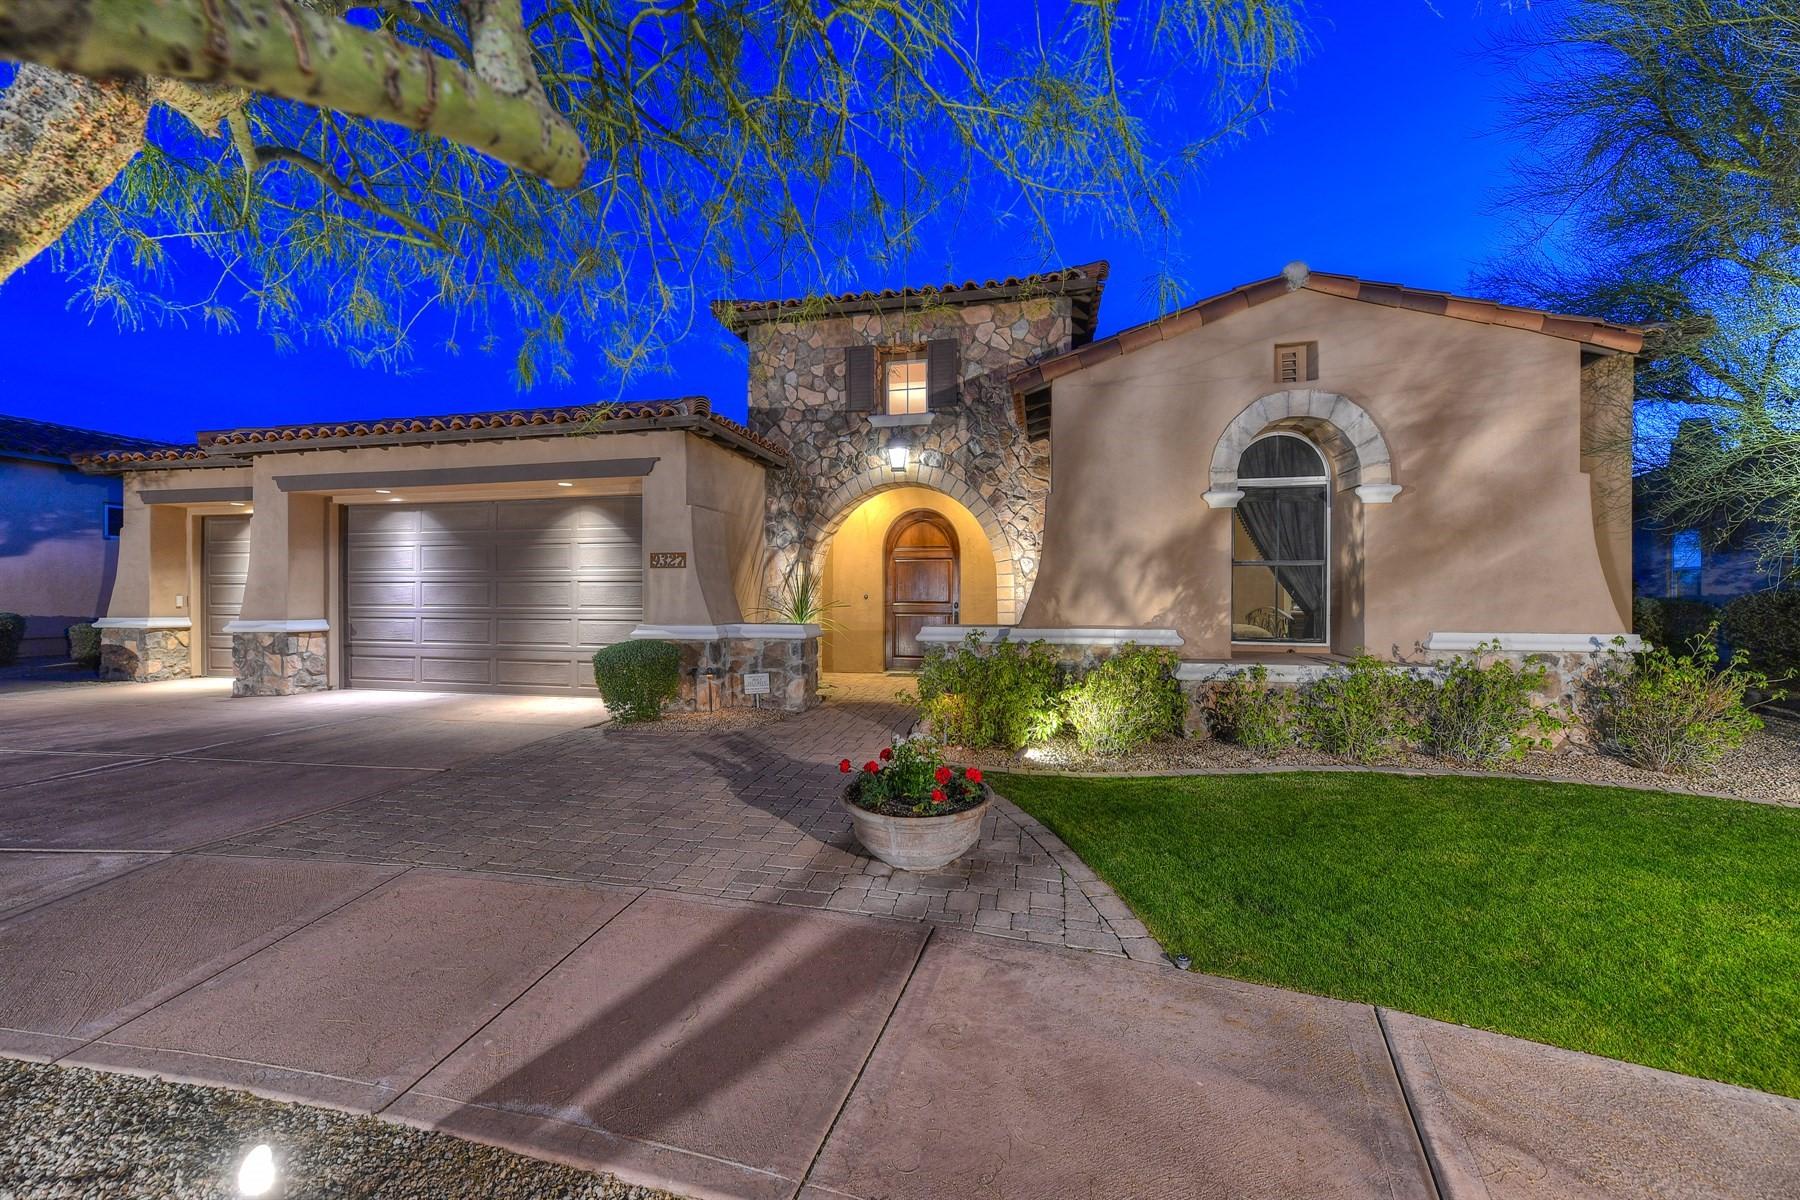 Maison unifamiliale pour l Vente à Highly upgraded home in desirable DC Ranch 9327 E Mountain Spring Rd Scottsdale, Arizona, 85255 États-Unis